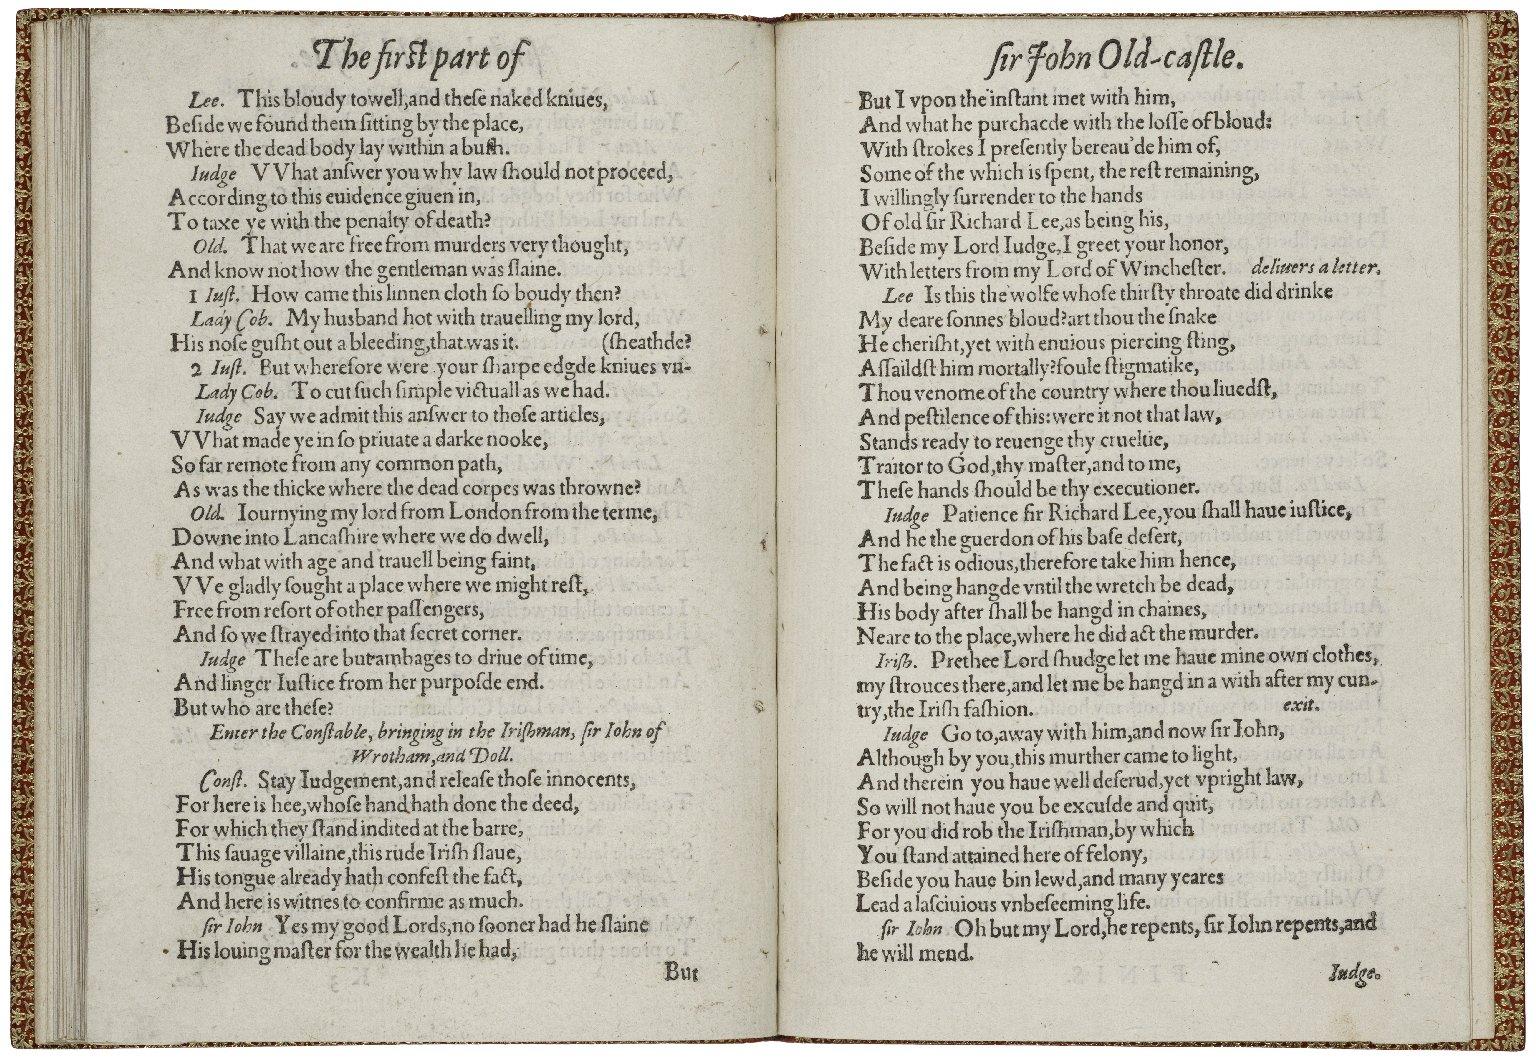 Sir John Oldcastle.